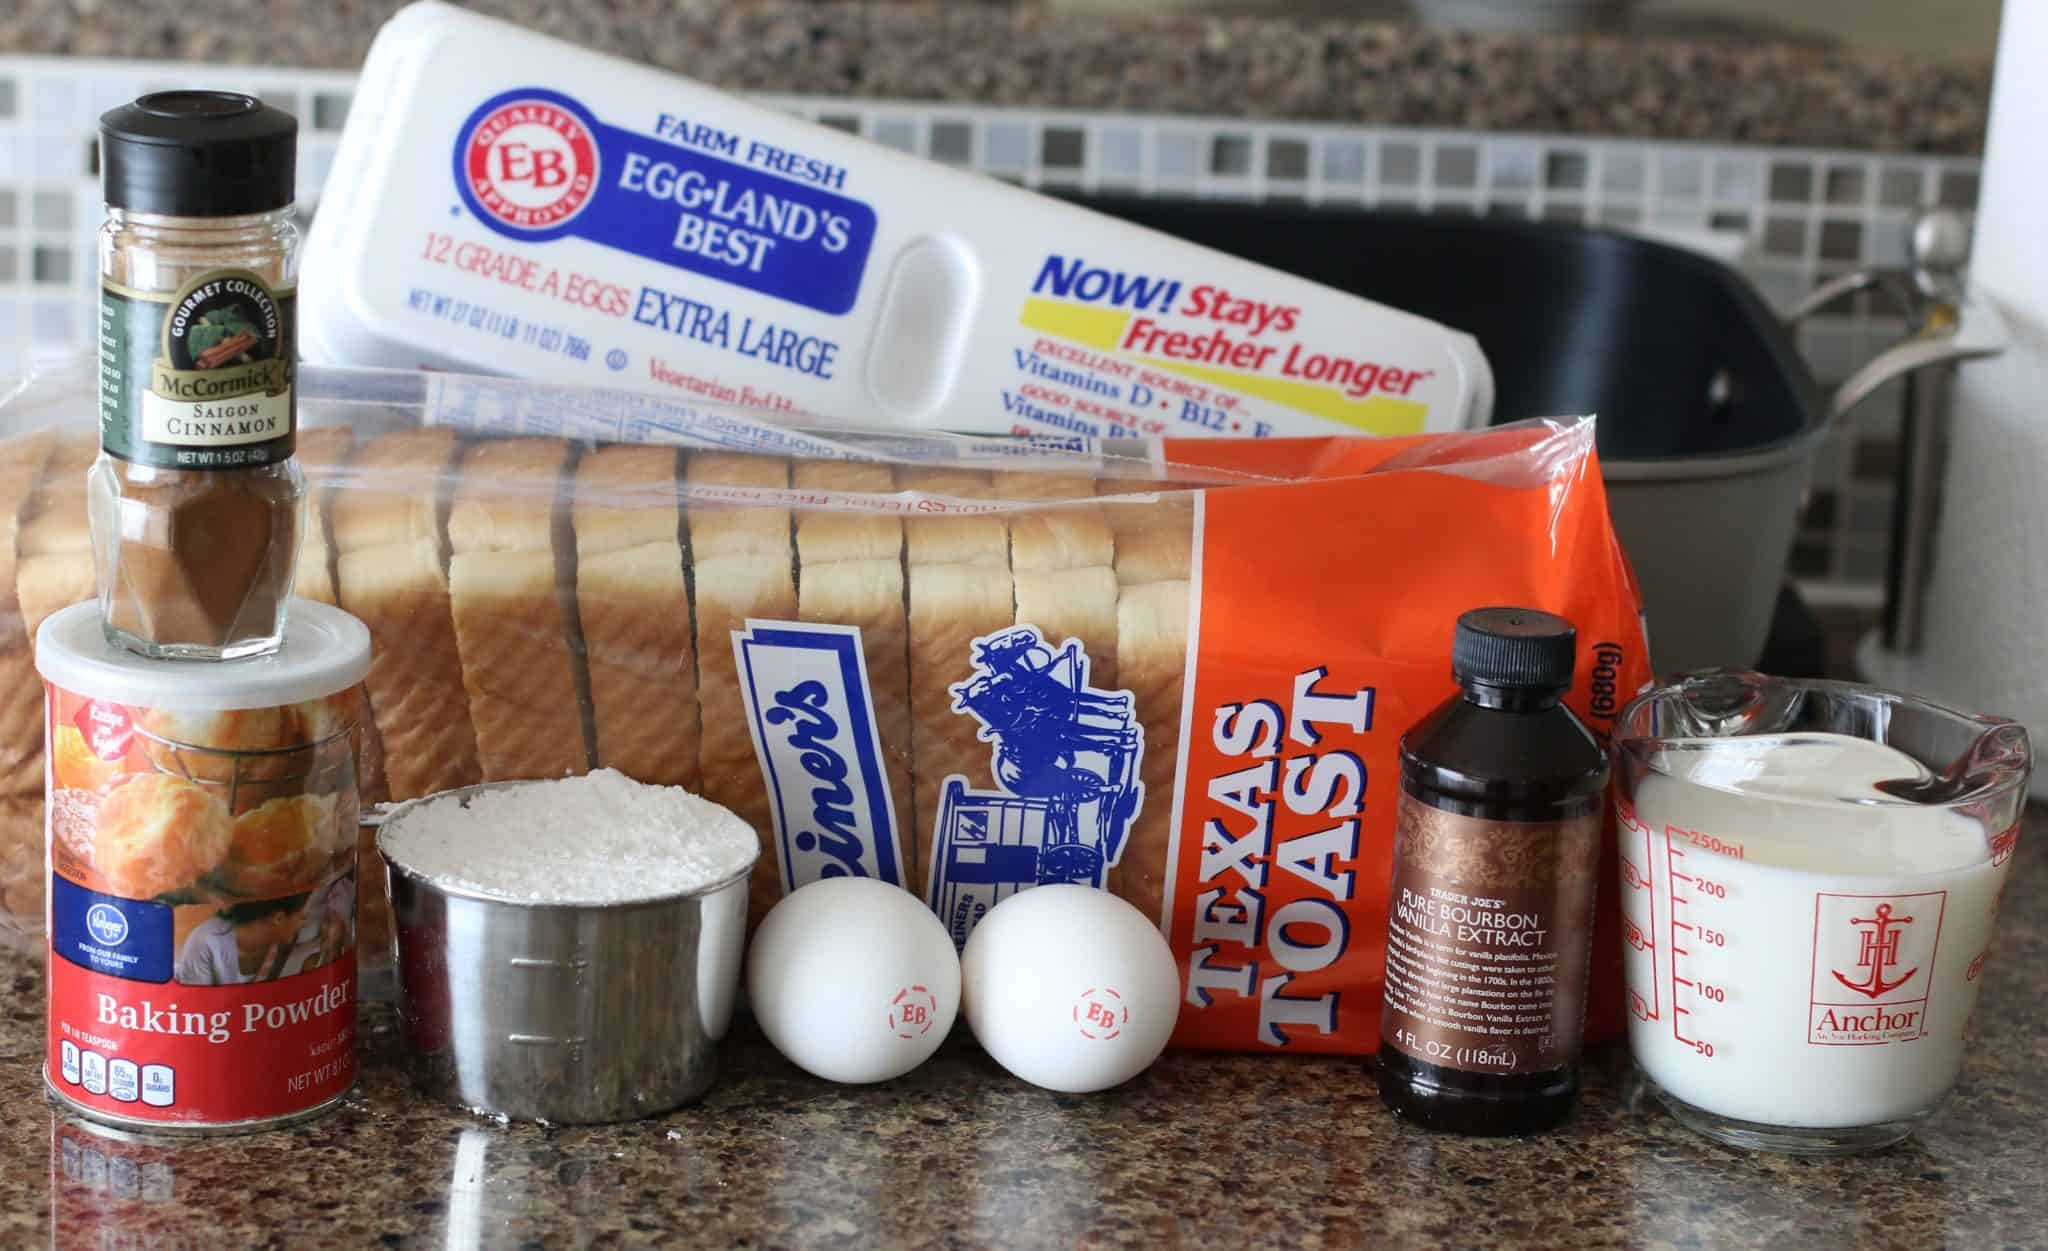 ingredients needed to make fluffy French toast: Texas toast, eggs, cinnamon, vanilla extract, milk